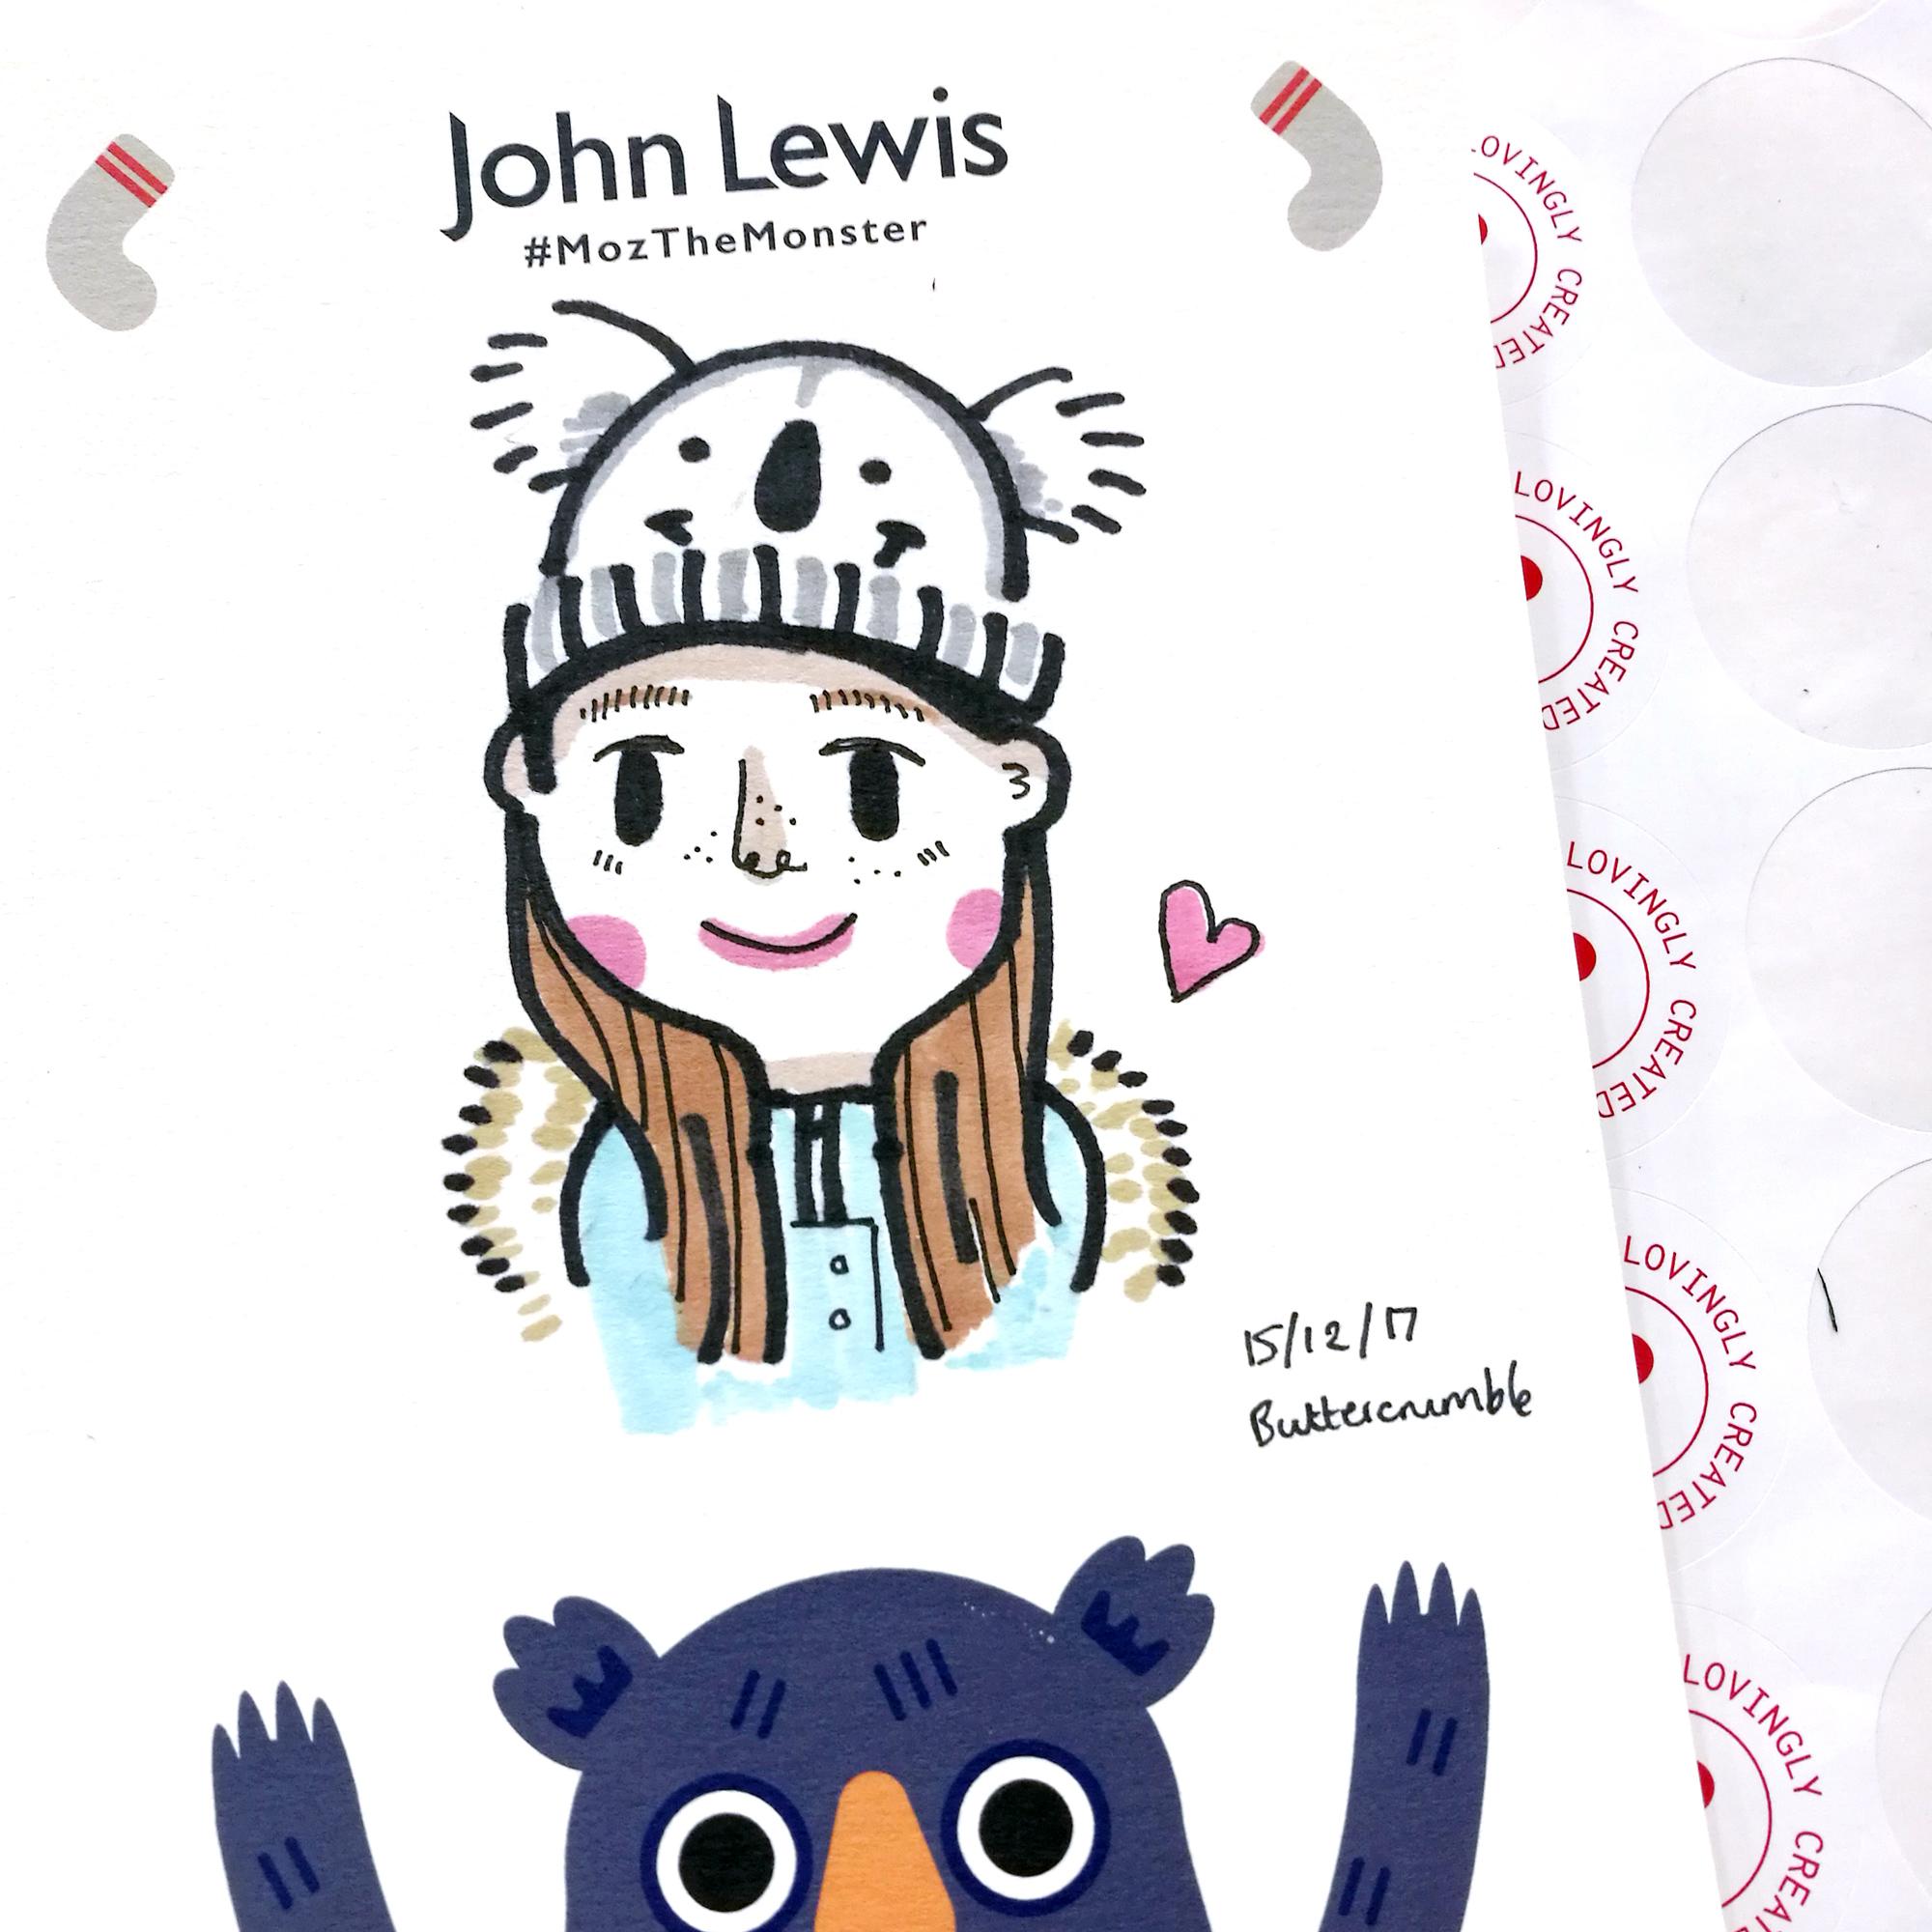 John-Lewis---Buttercrumble---Moz-the-Monster---Portrait-Example-2.jpg